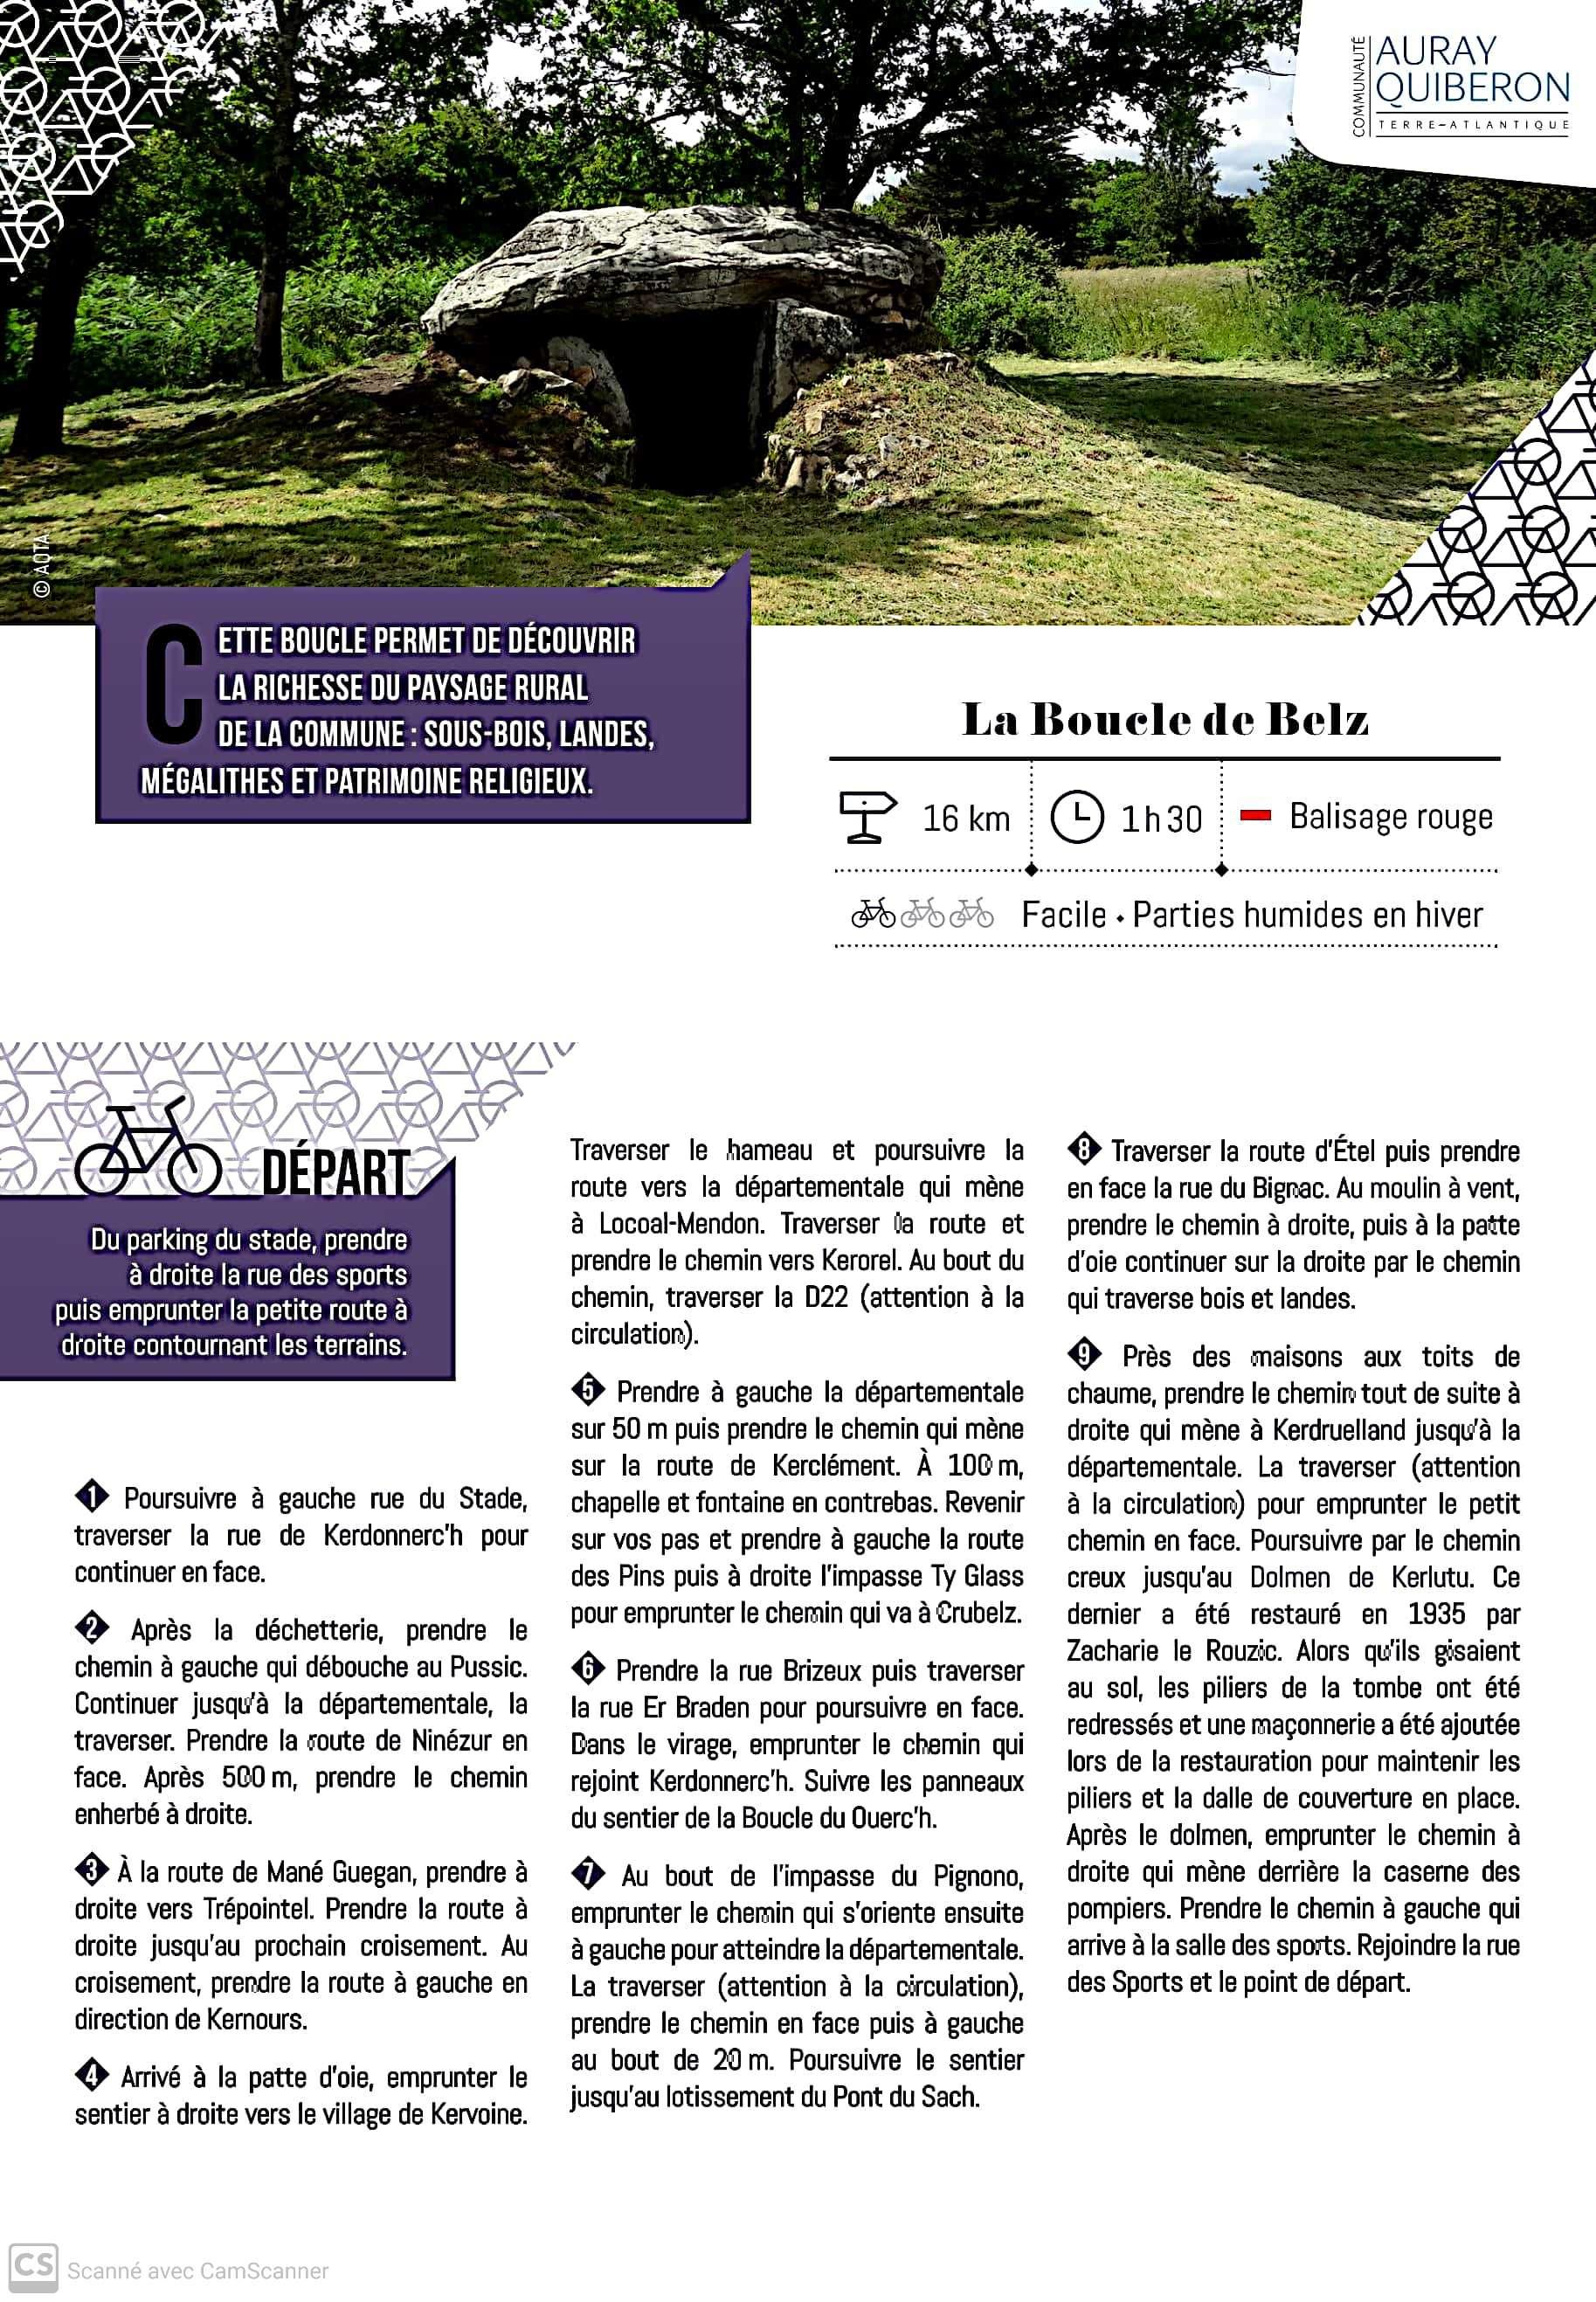 15_cyclo_belz_la+boucle+de+belz_1.jpg